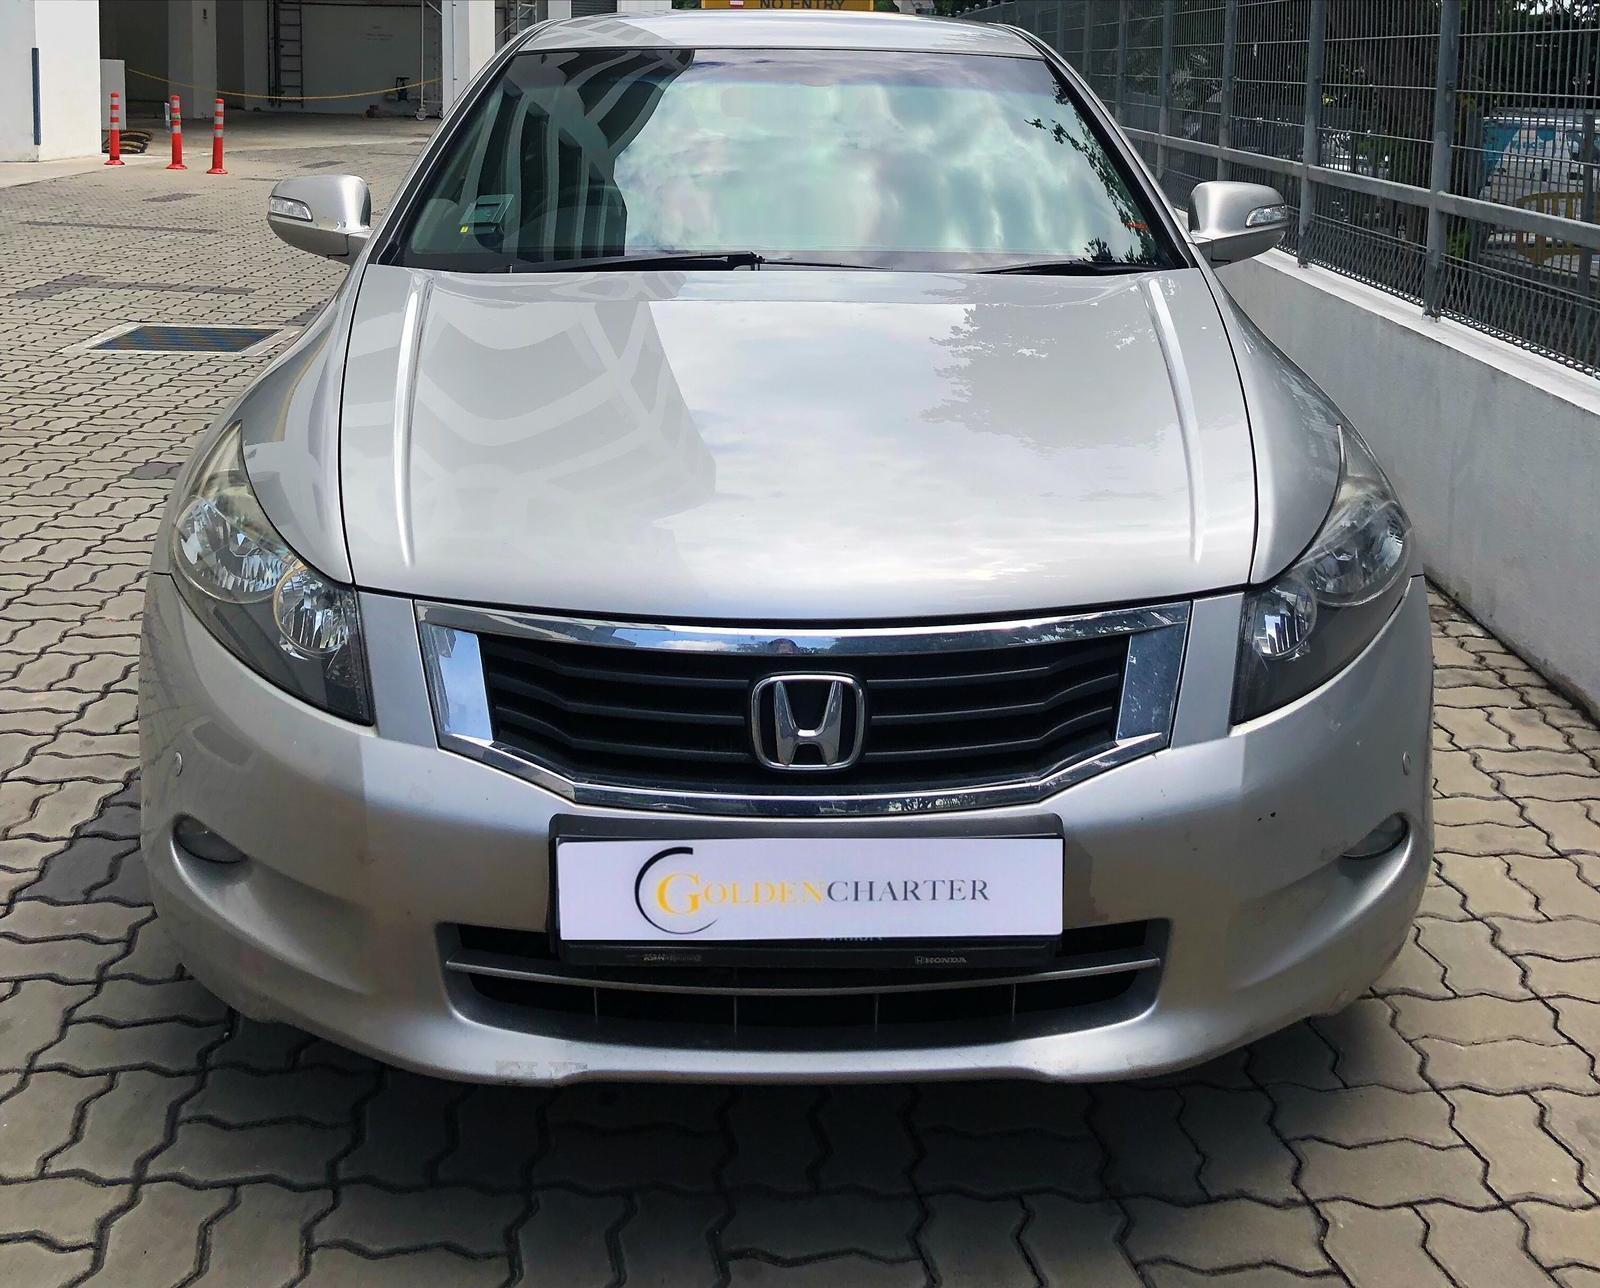 Honda Accord Gojek Grab Ryde Personal use Cheapest rental